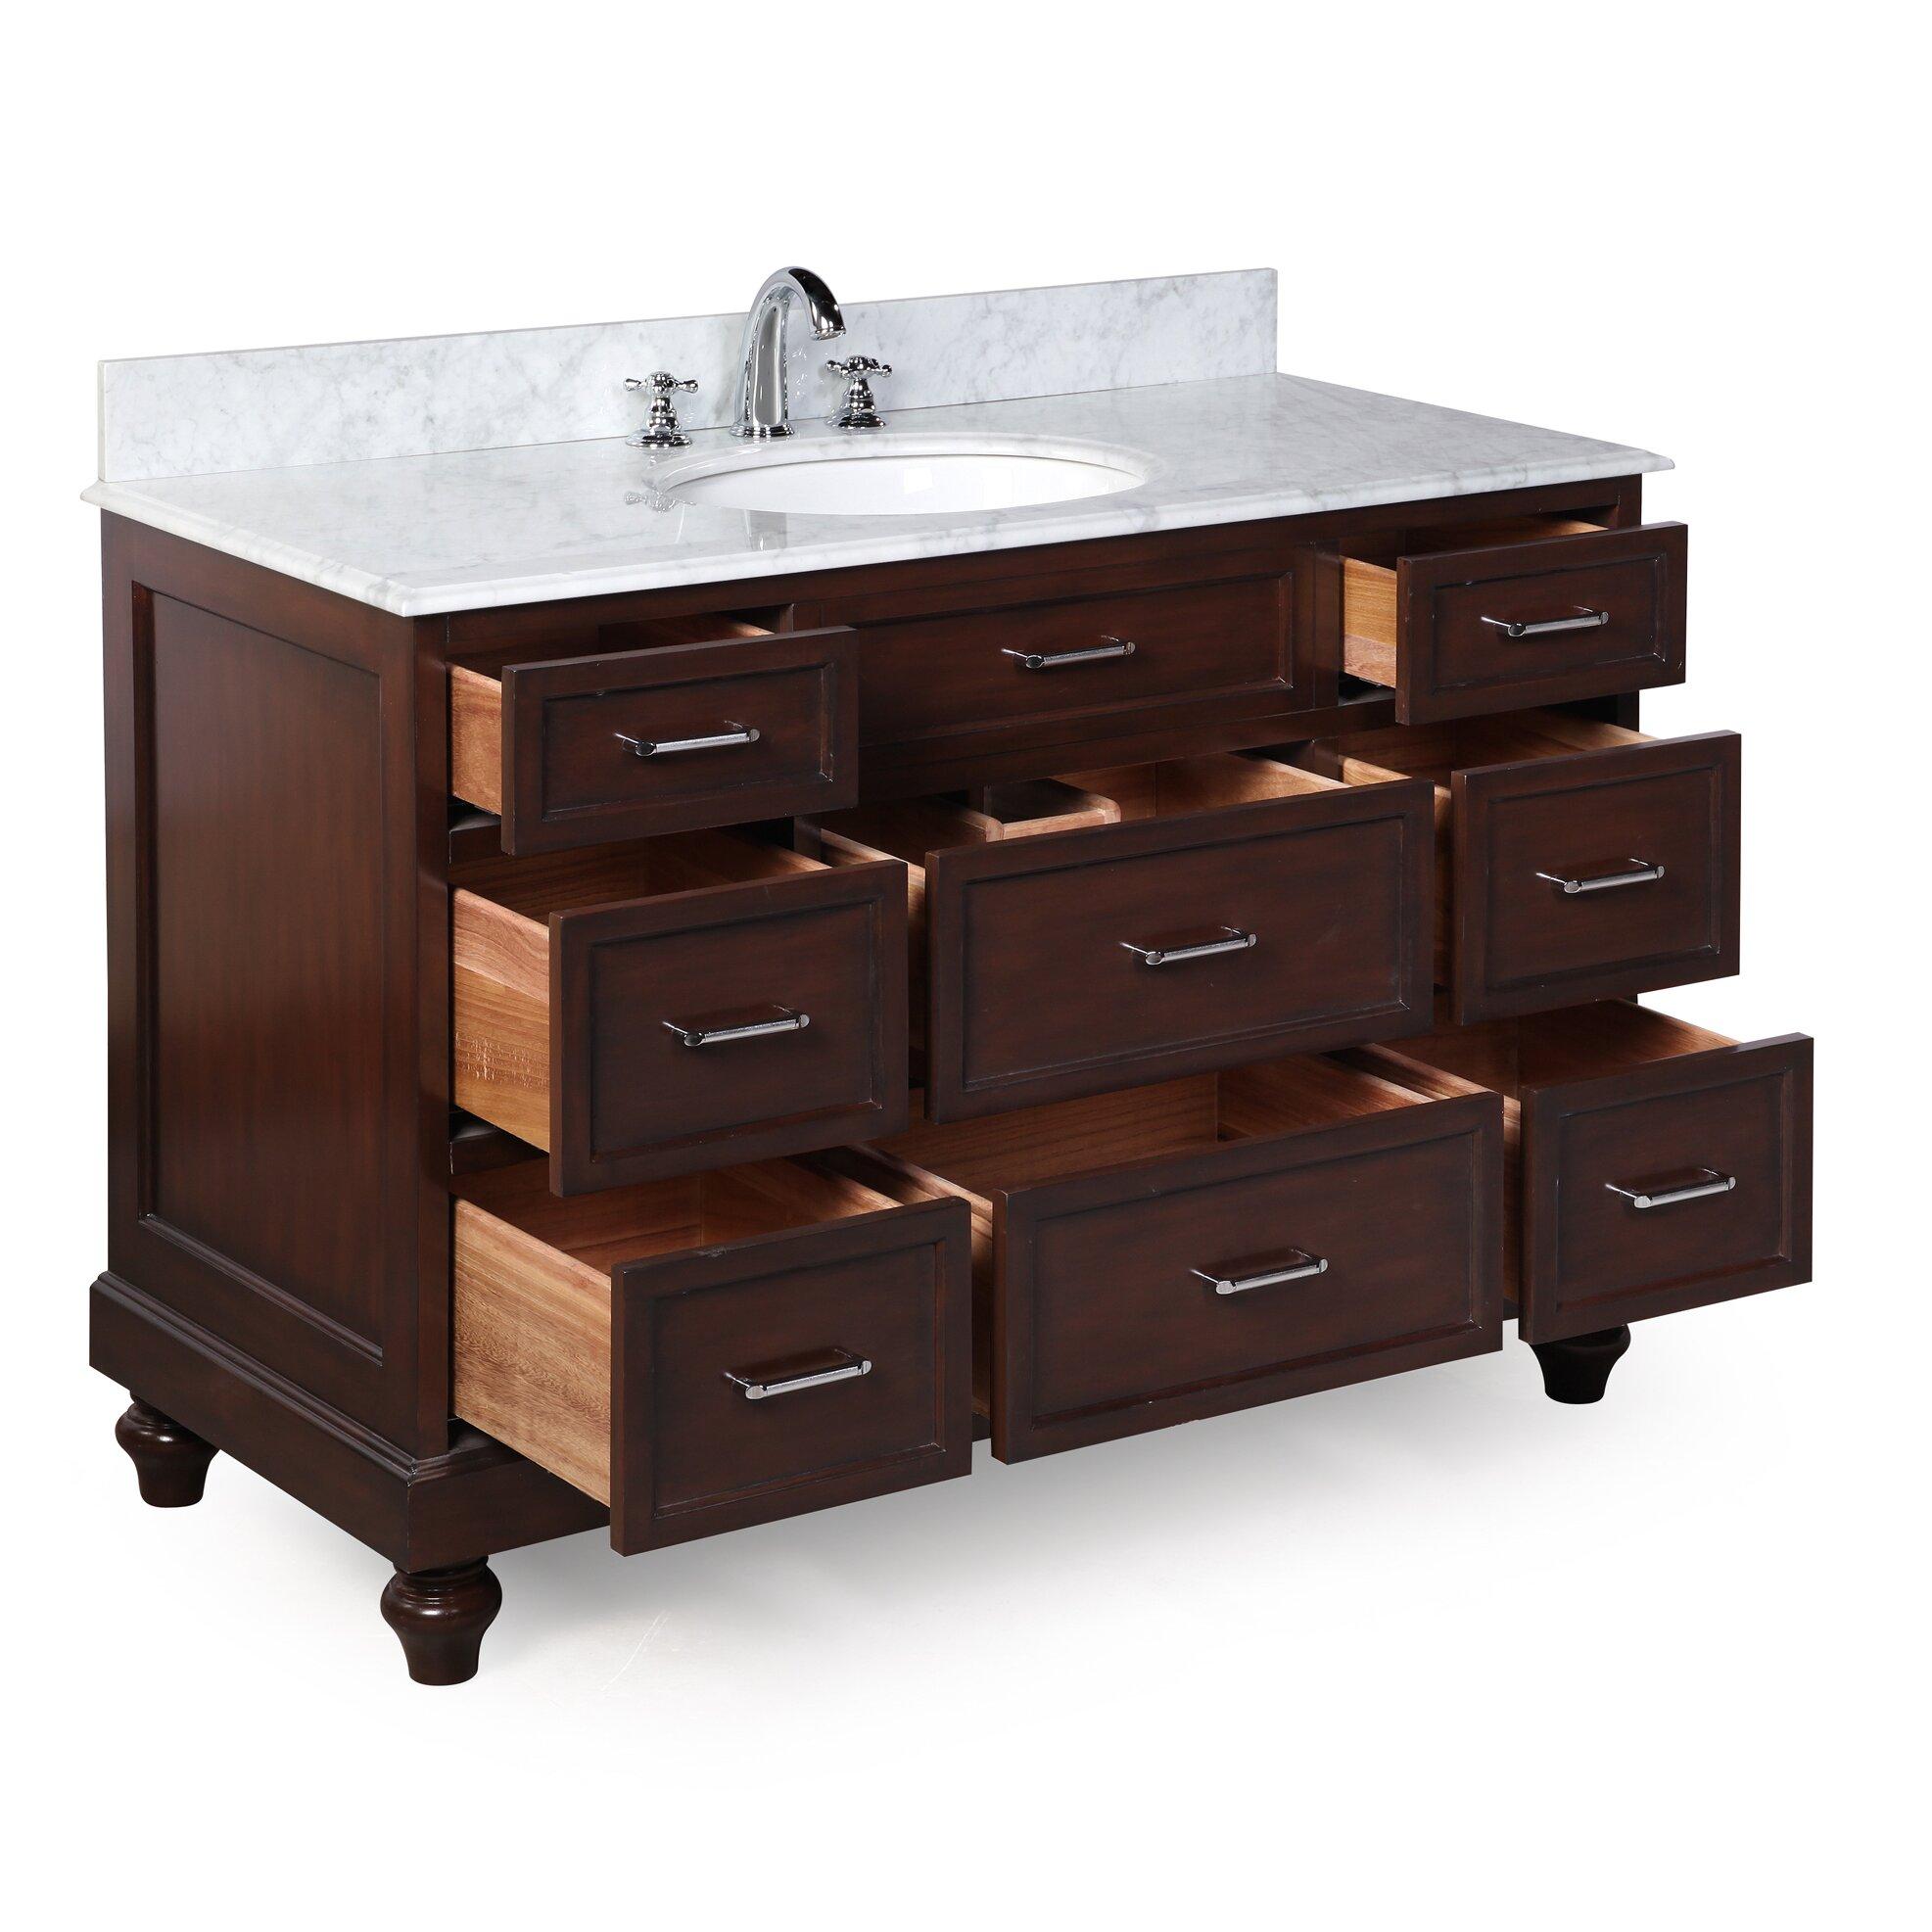 "Used Bathroom Vanity Sets For Sale: KBC Amelia 48"" Single Bathroom Vanity Set & Reviews"